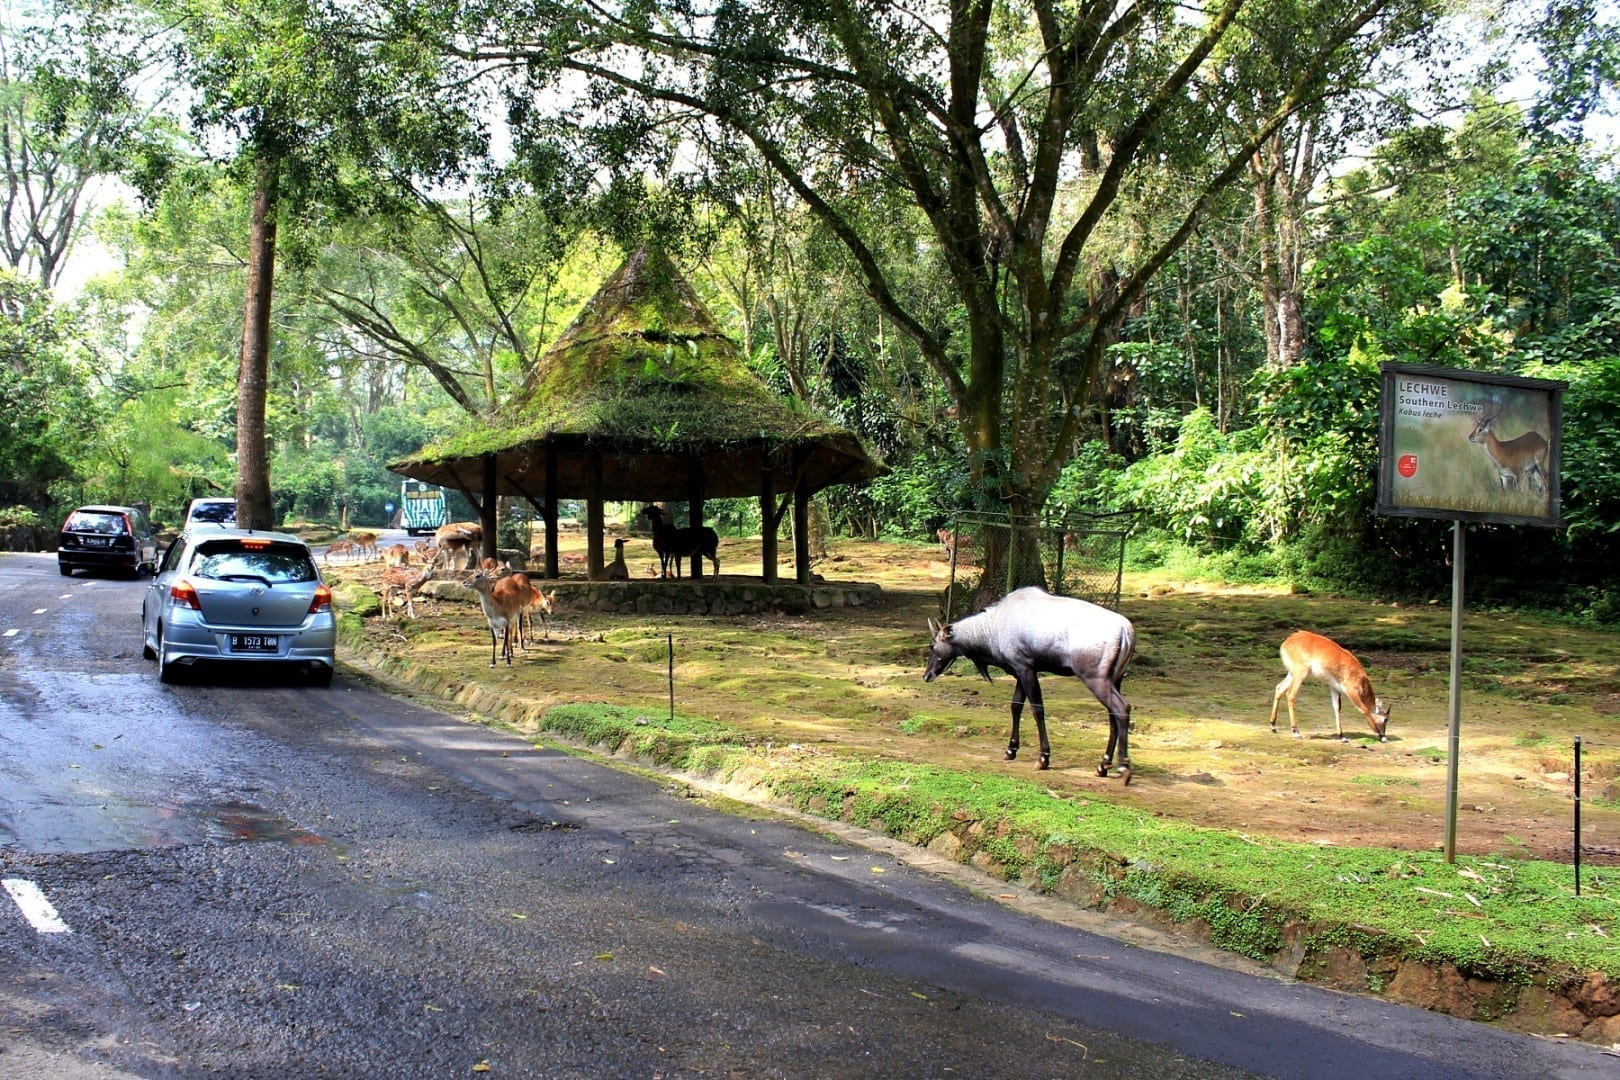 Taman Safari Indonesia. Puncak Indonesia